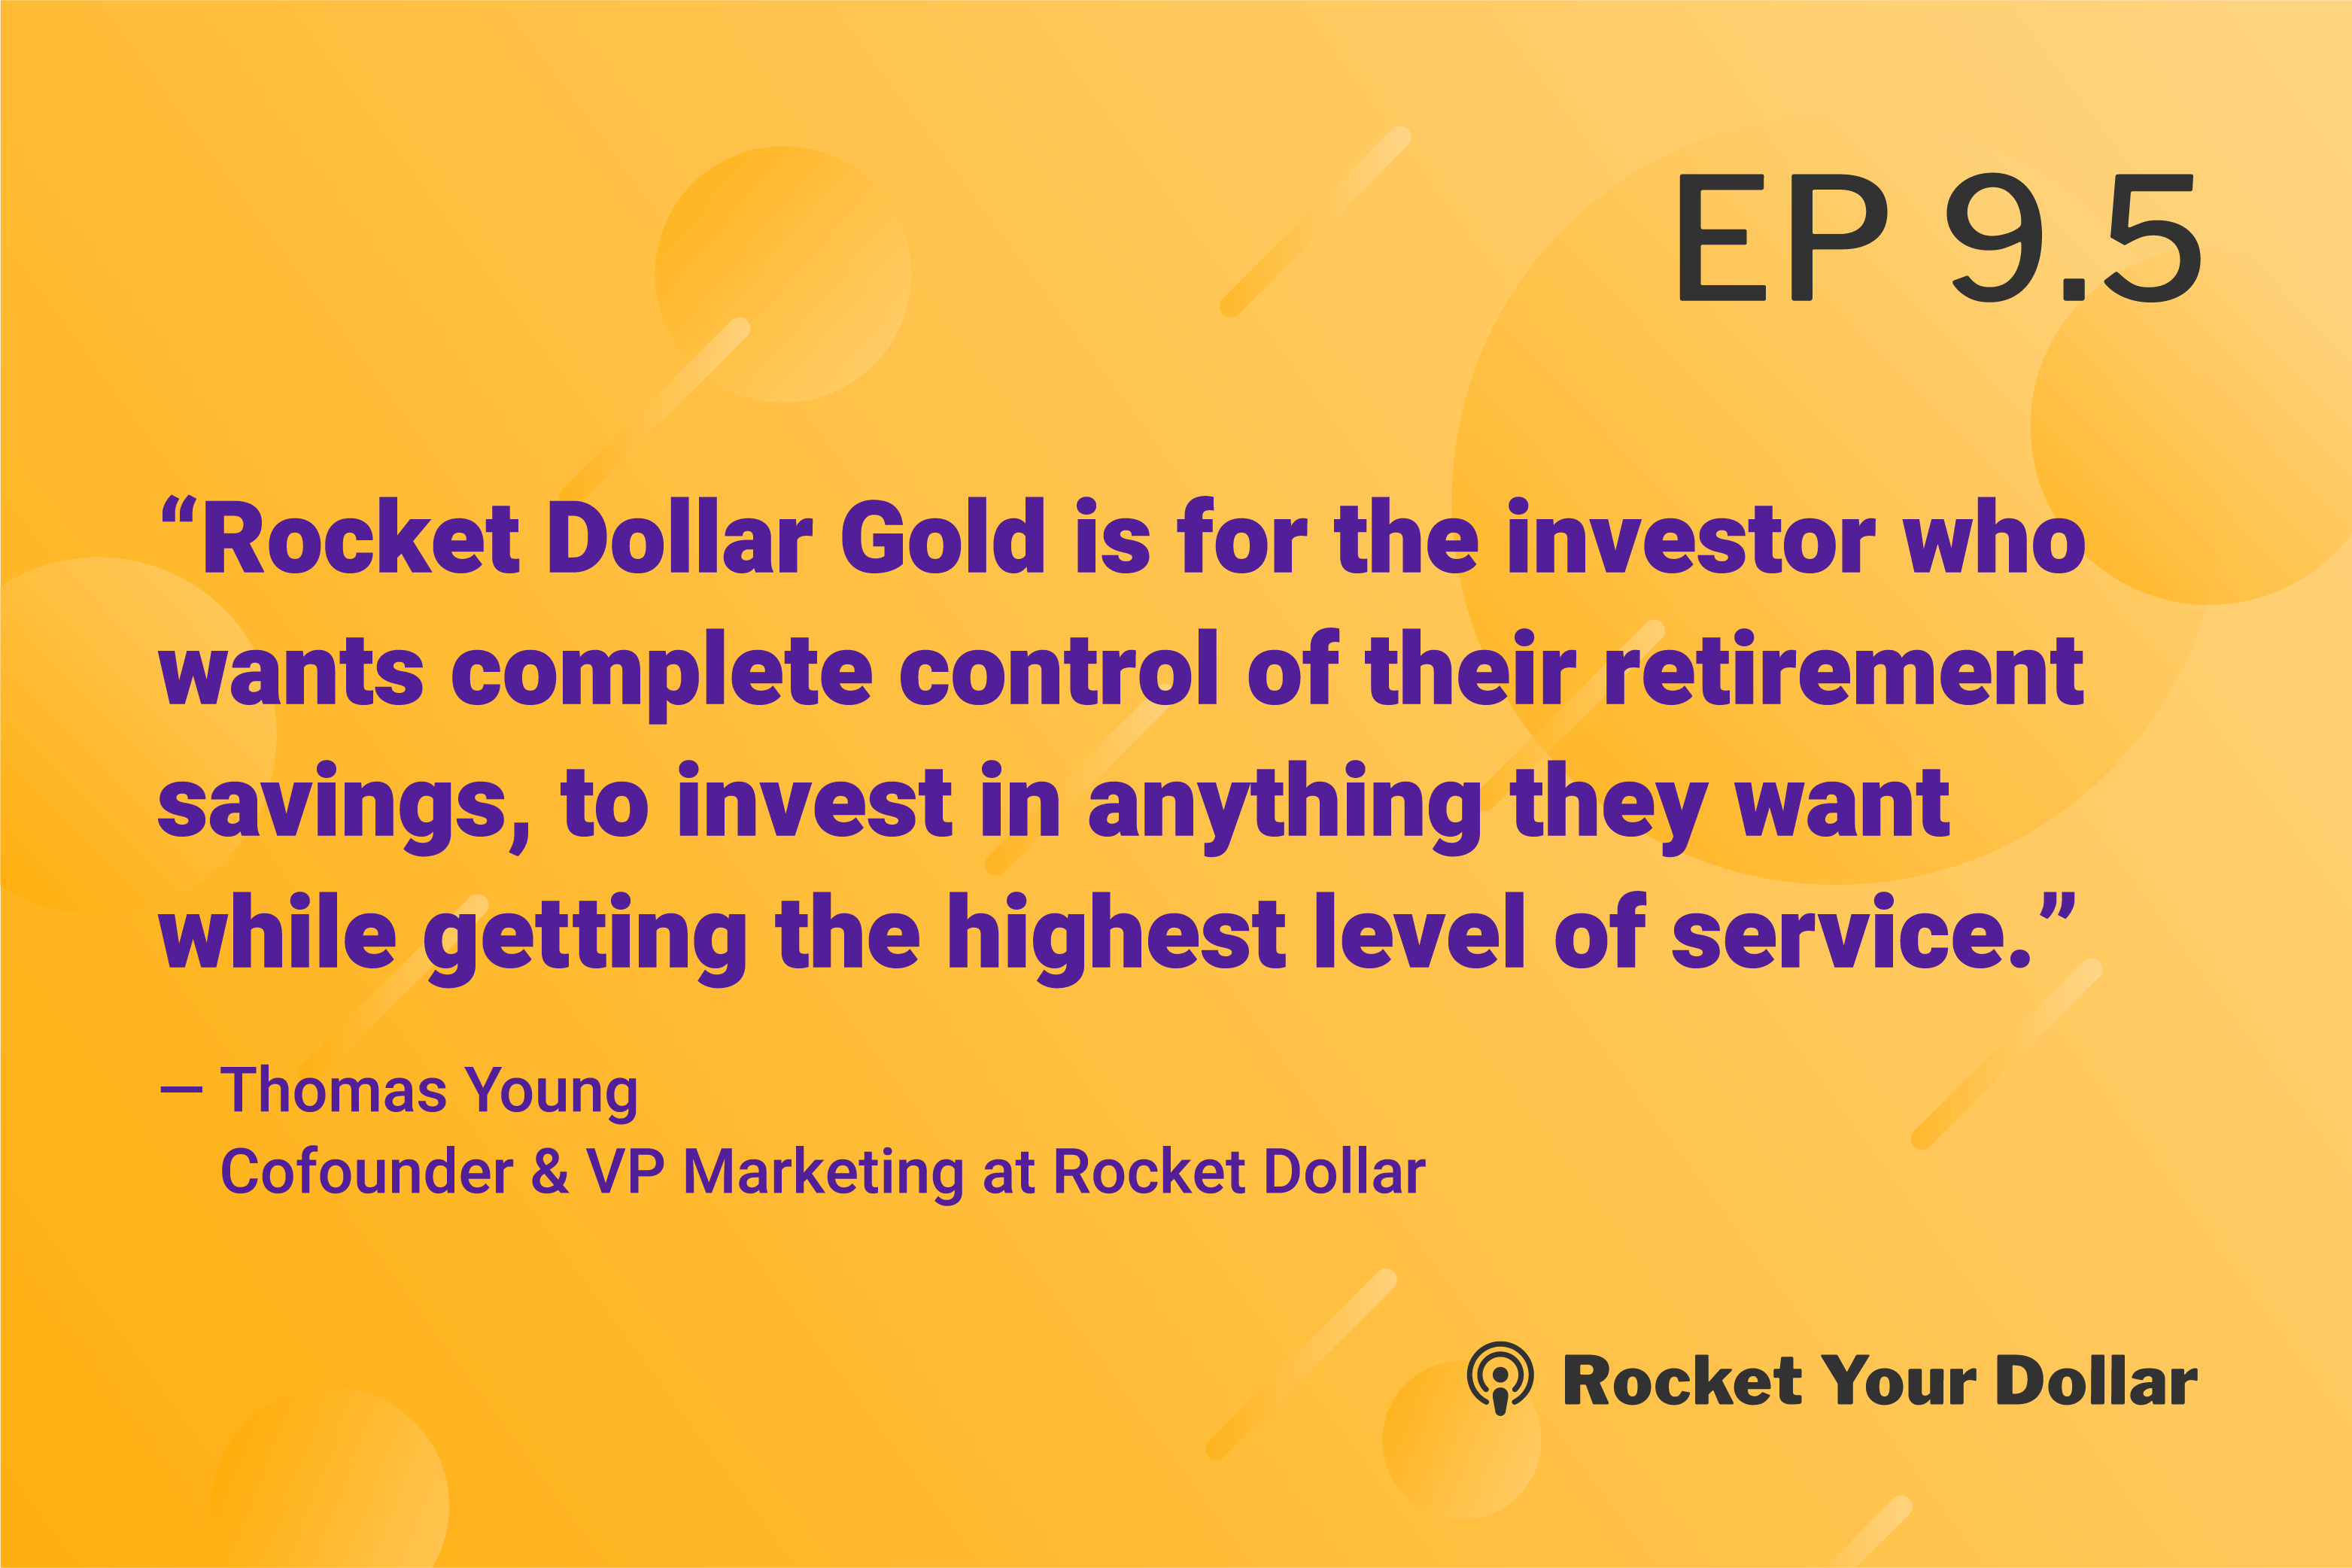 BONUS Episode: Rocket Dollar Gold, The Premium Self-Directed Account